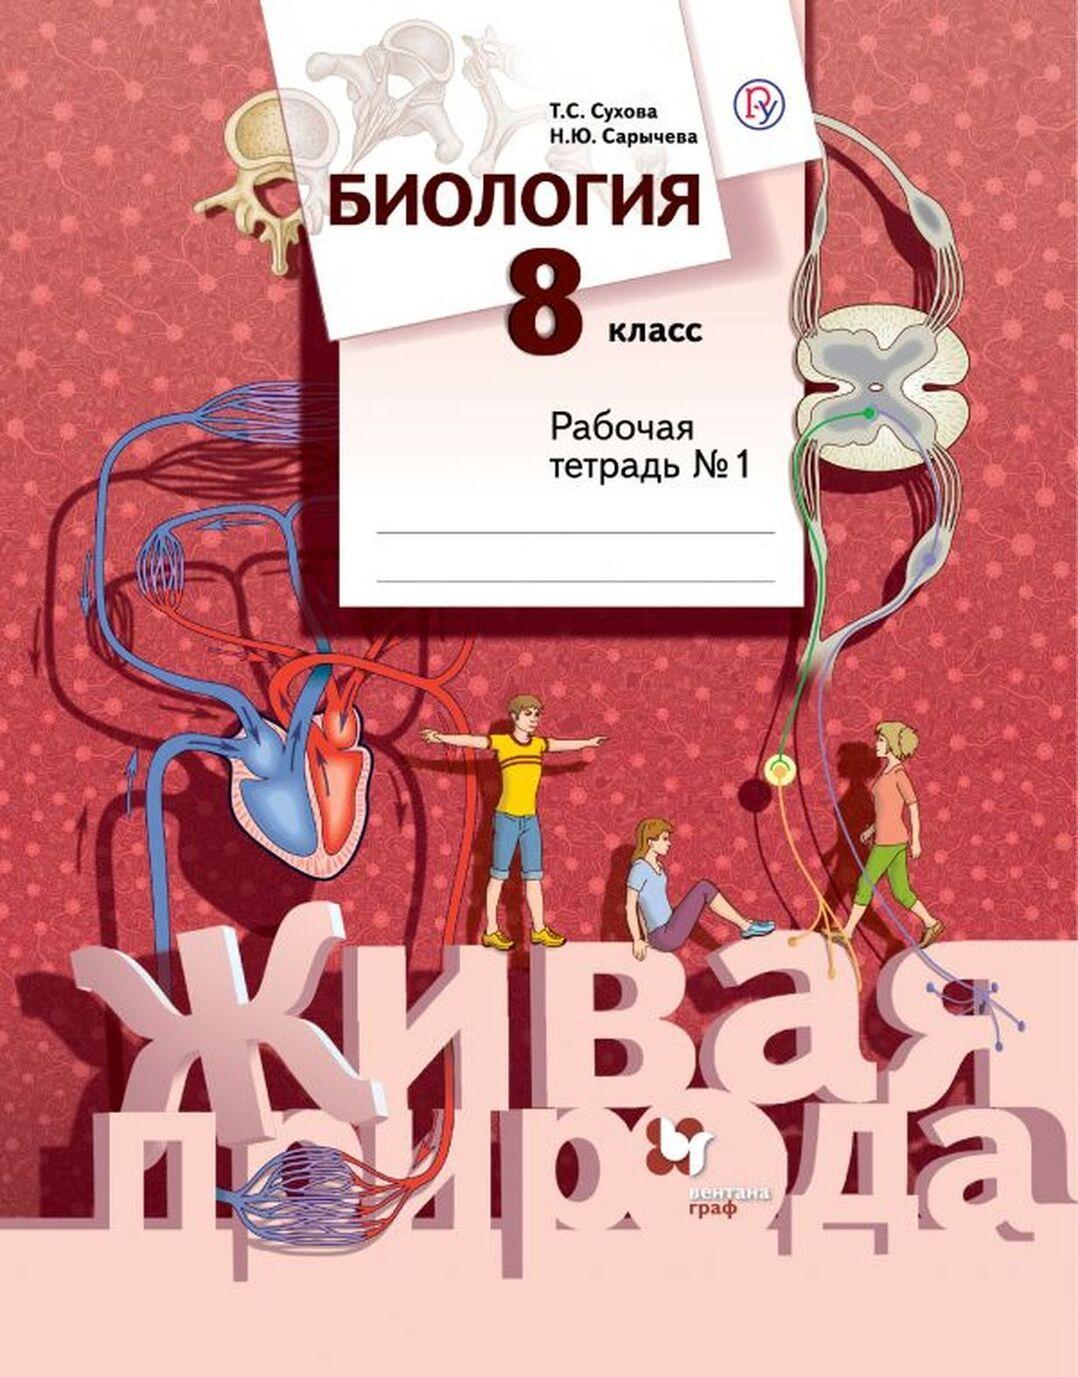 Biologija. 8 klass. Rabochaja tetrad № 1 | Sukhova Tamara Sergeevna, Sarycheva Natalija Jurevna